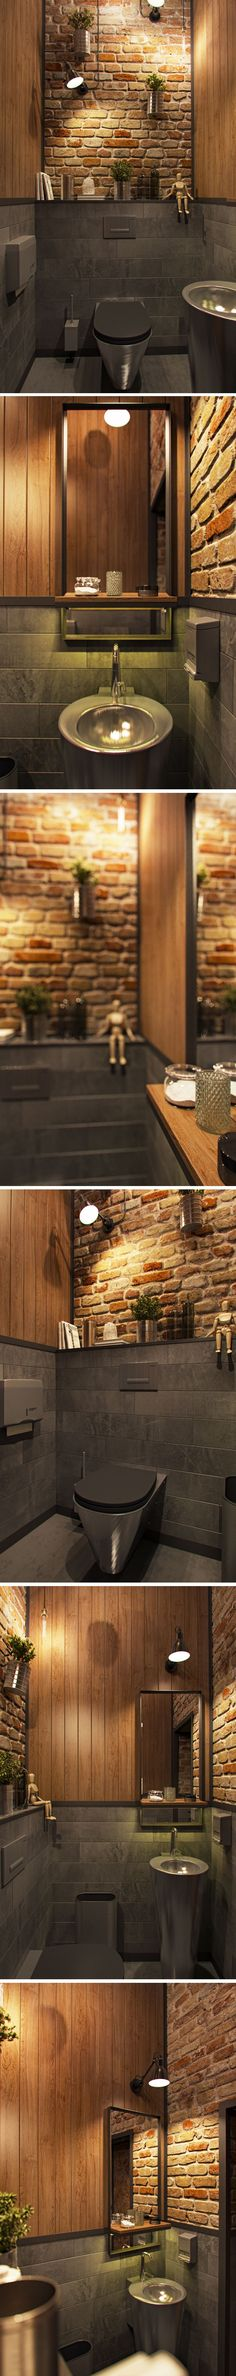 toilet | loft - Галерея 3ddd.ru